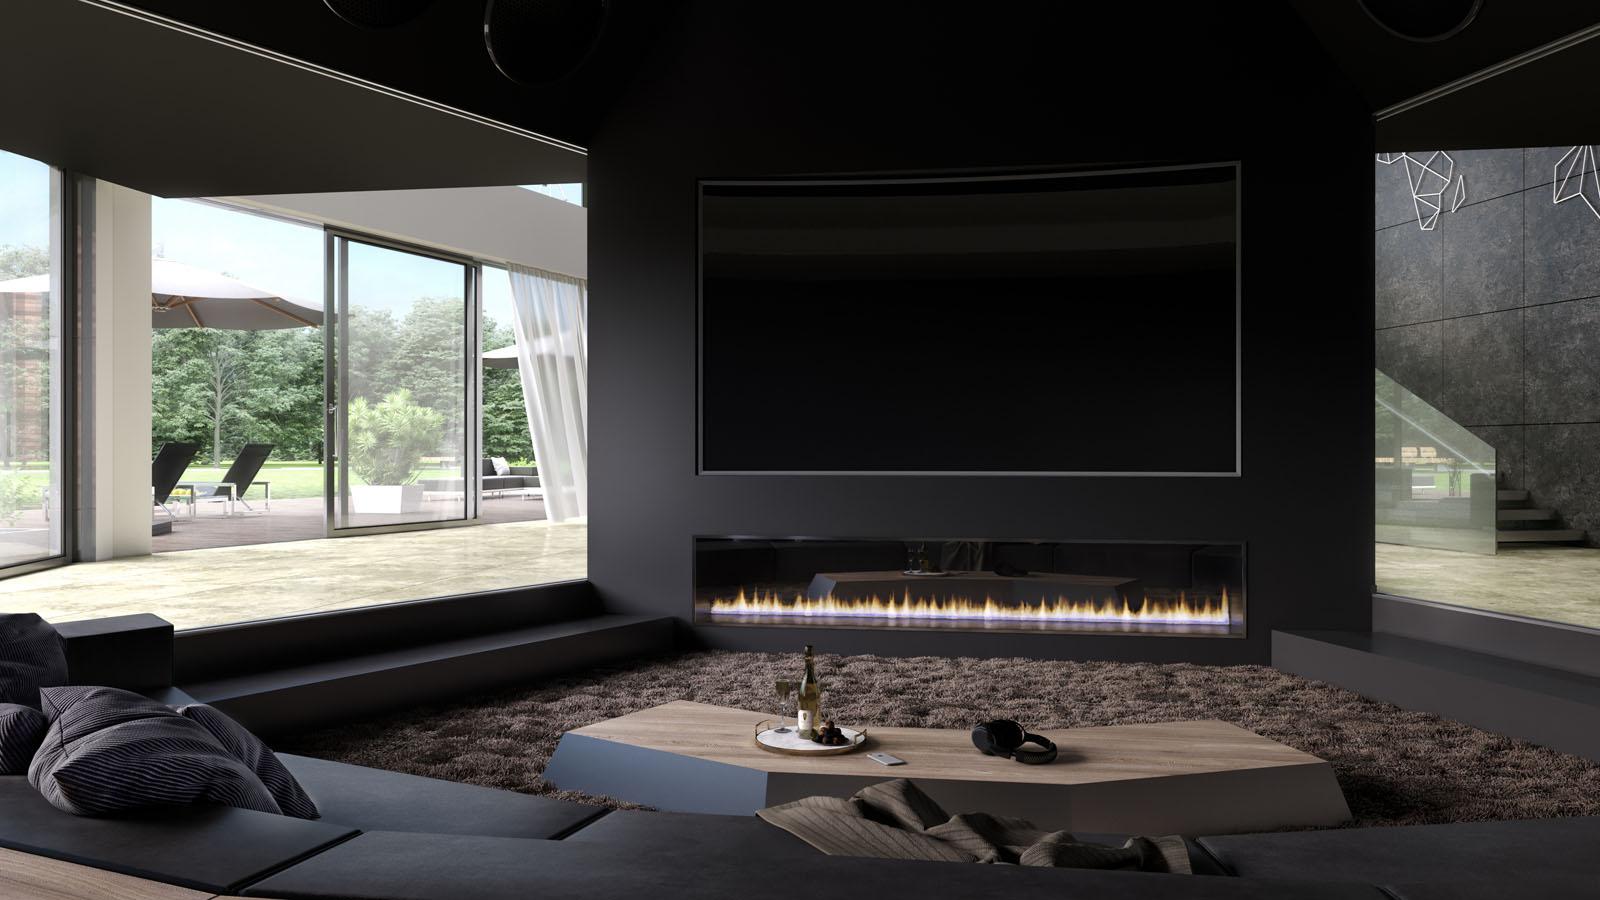 3d interieur ontwerpvisualisatie luxe woning choro. Black Bedroom Furniture Sets. Home Design Ideas